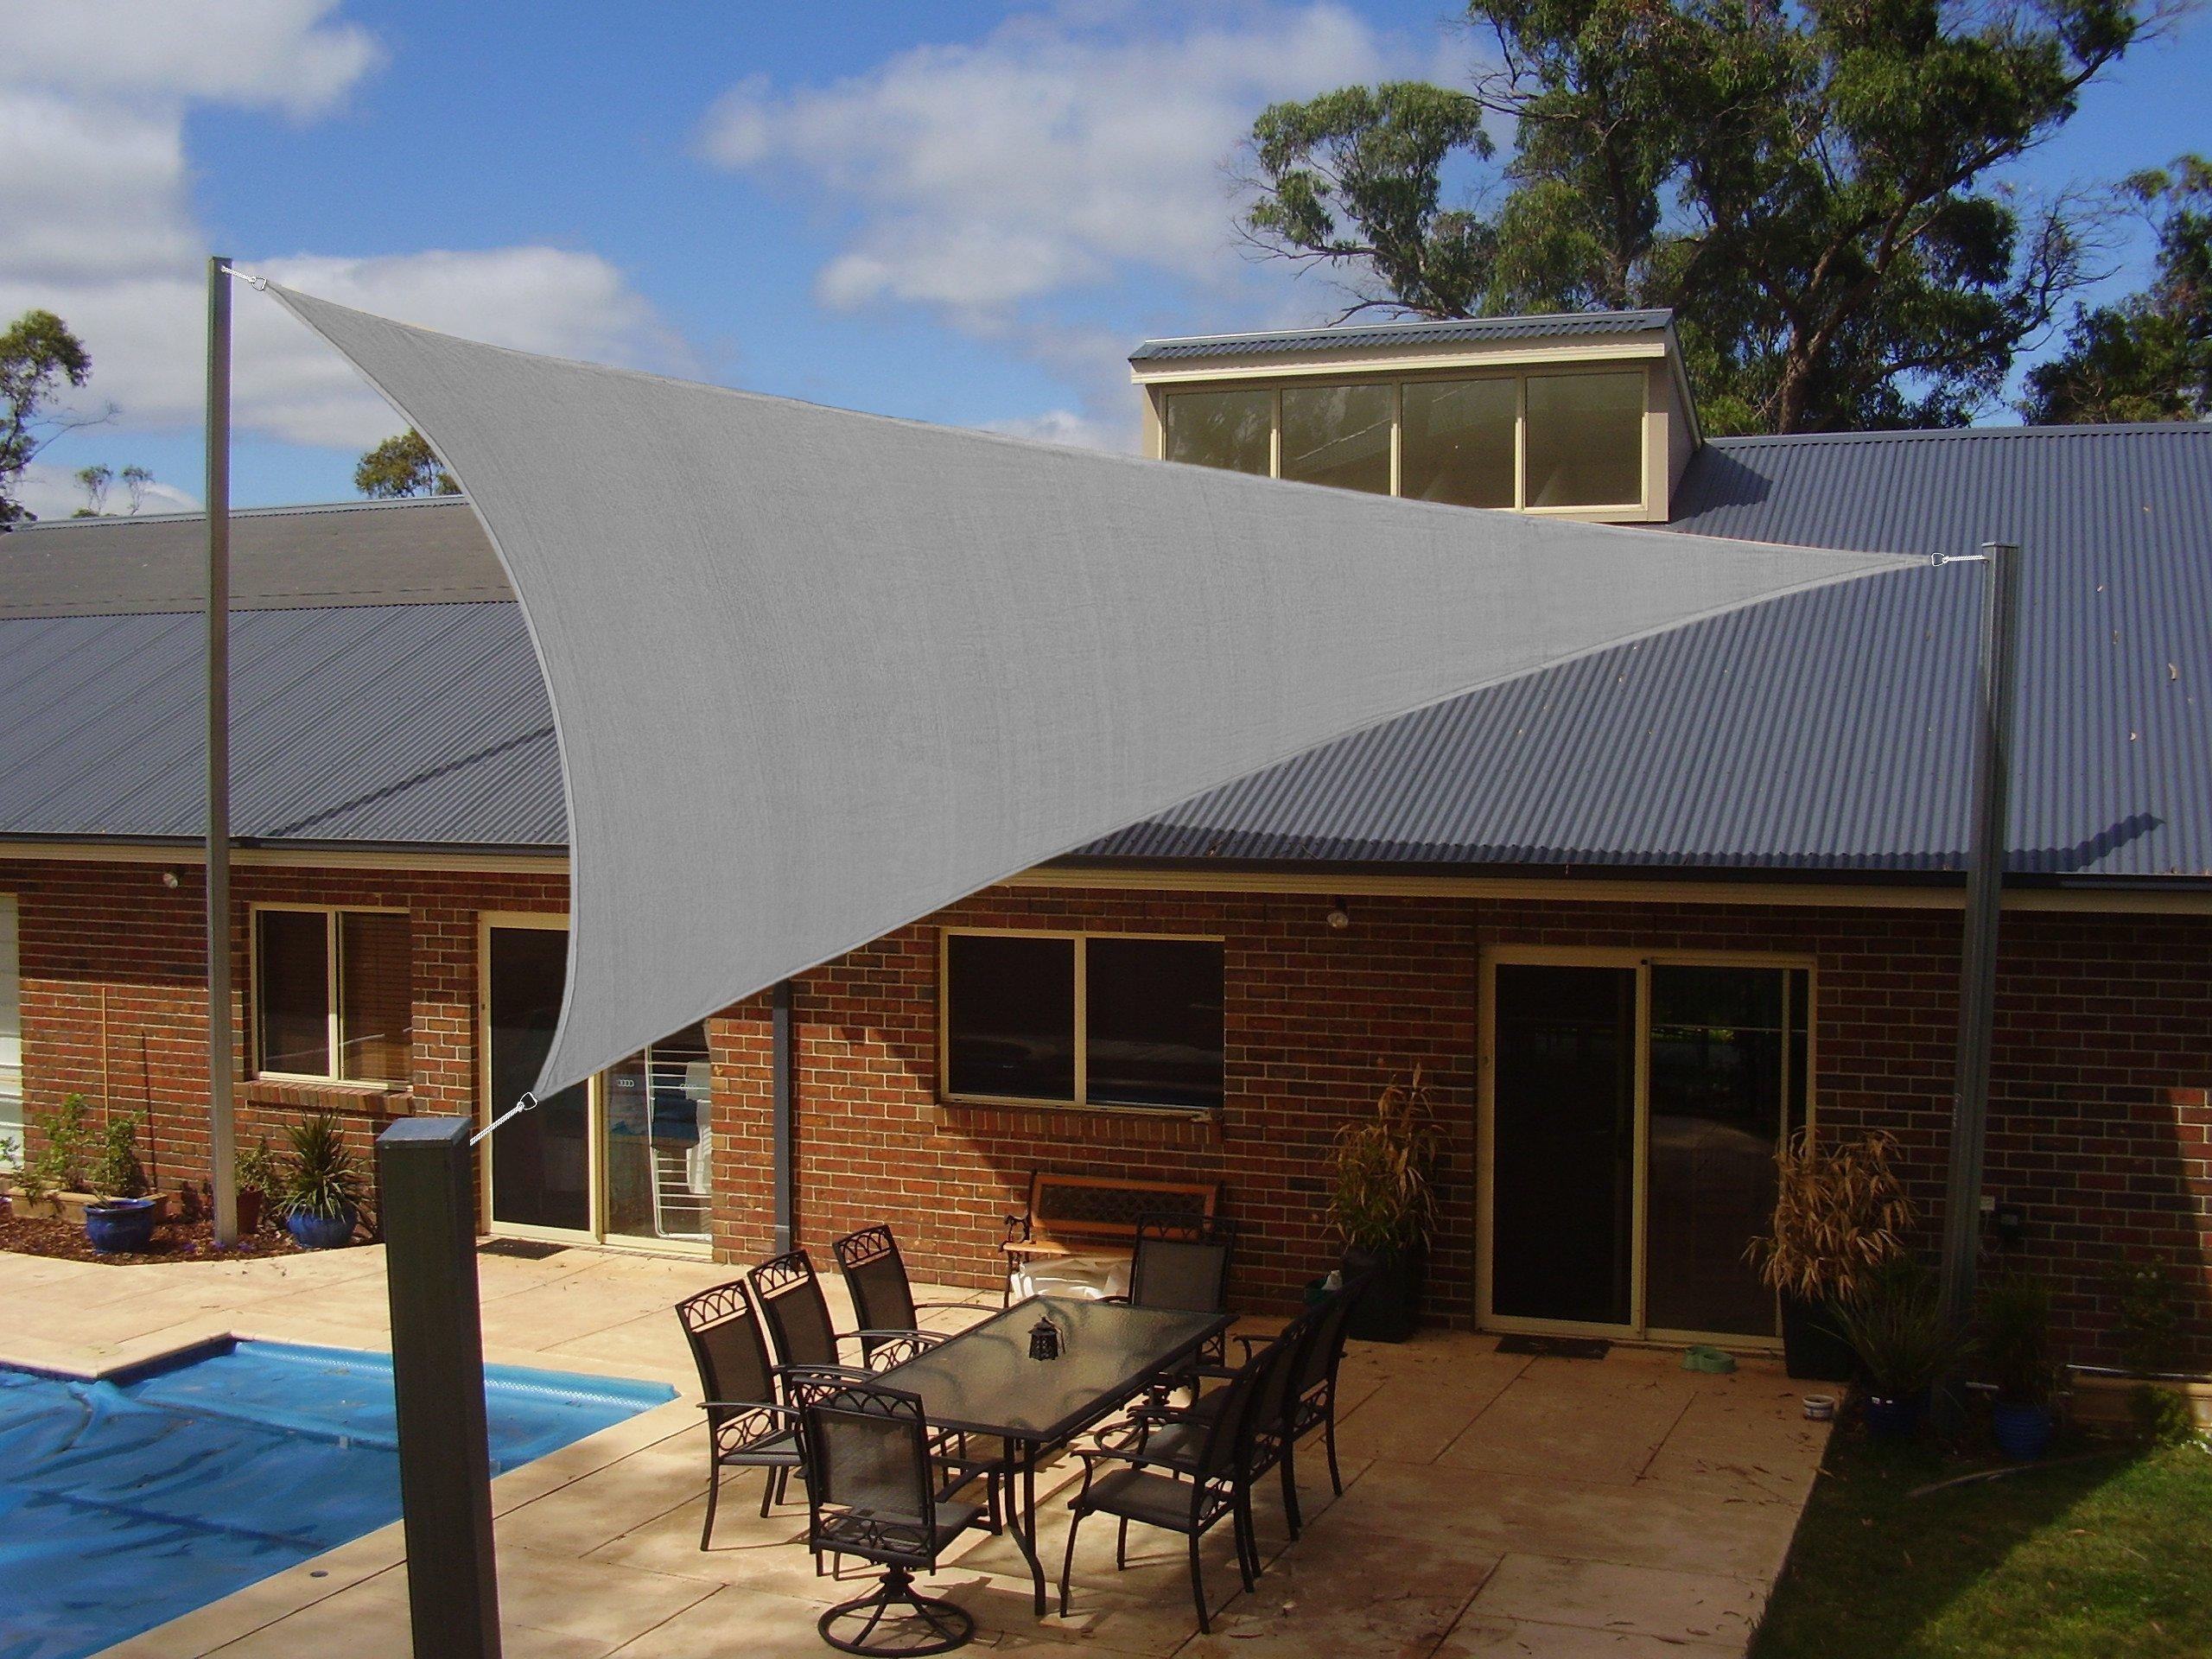 Coconut Heavy Duty Triangle Sun Shade Sail, UV Block Canopy Shelter for Outdoor Patio Garden Deck Backyard 12' x 12'x 12' Light Grey 5 Years Warranty